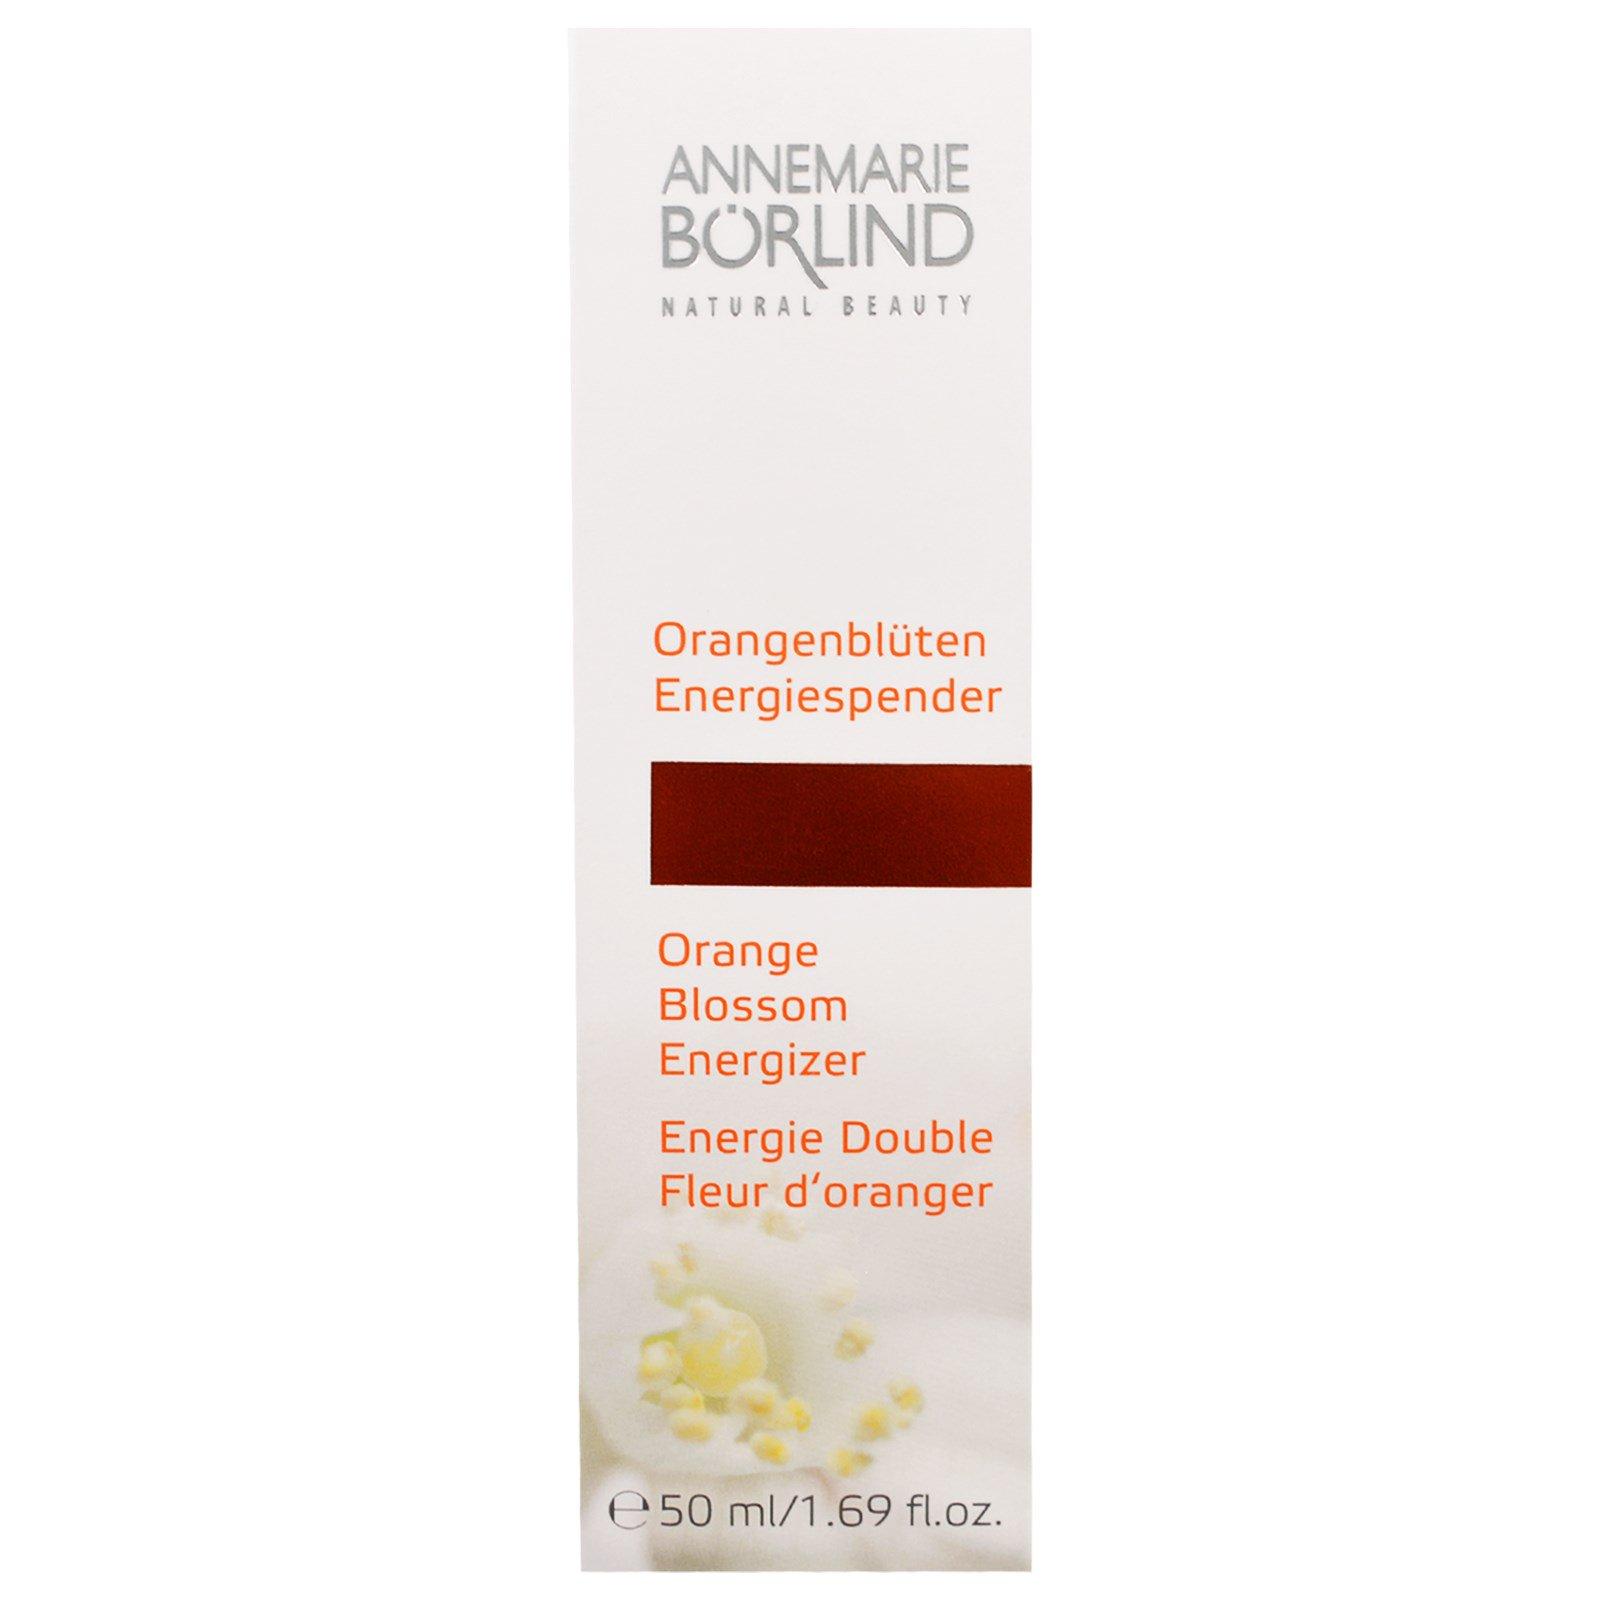 Annemarie Borlind - Natural Beauty Rose Blossom Revitalizing Facial Care - 1.69 fl. oz. Desert Essence Daily Essential Moisturizer, 4.0 FL OZ